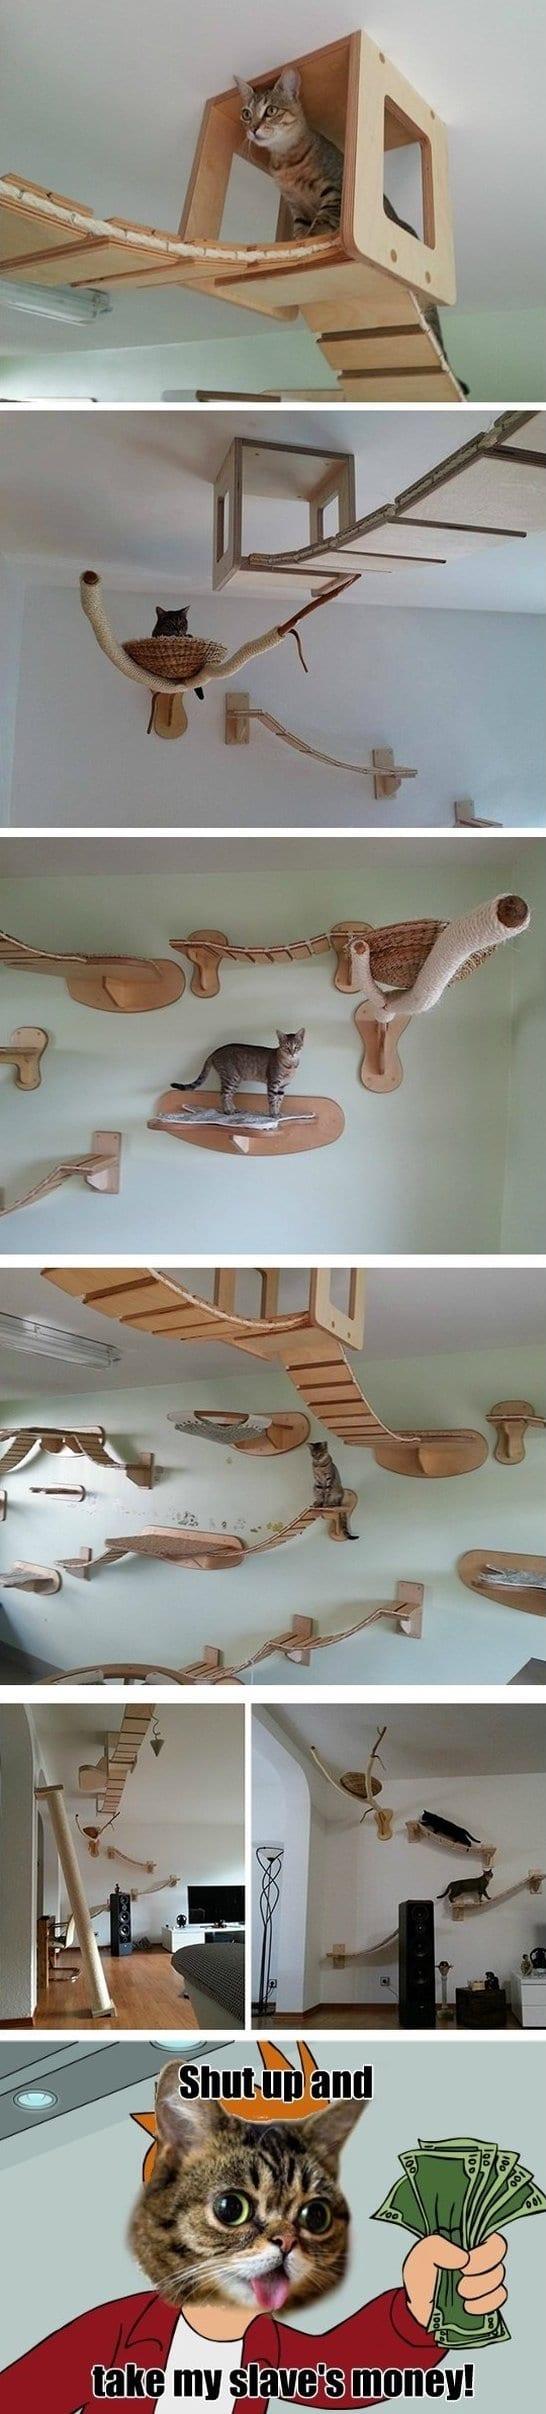 funny cat furniture meme jokes